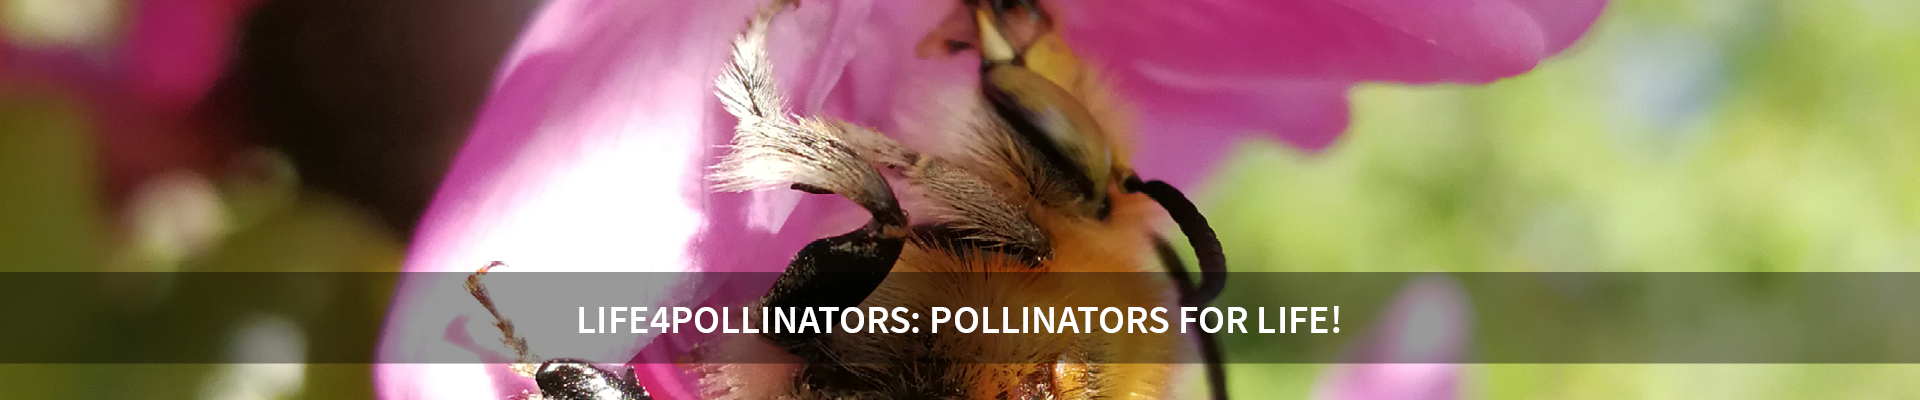 LIFE4POLLINATORS: Pollinators for Life! -